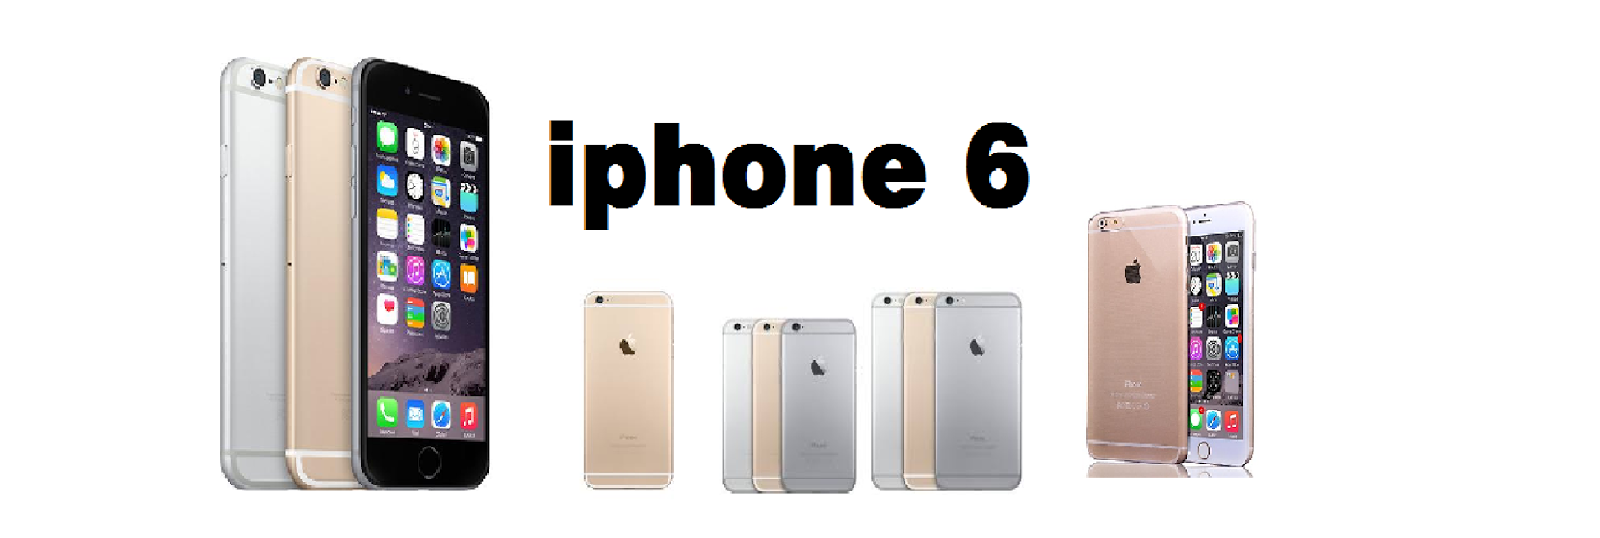 b8c78b61a Promoção de Iphone 6